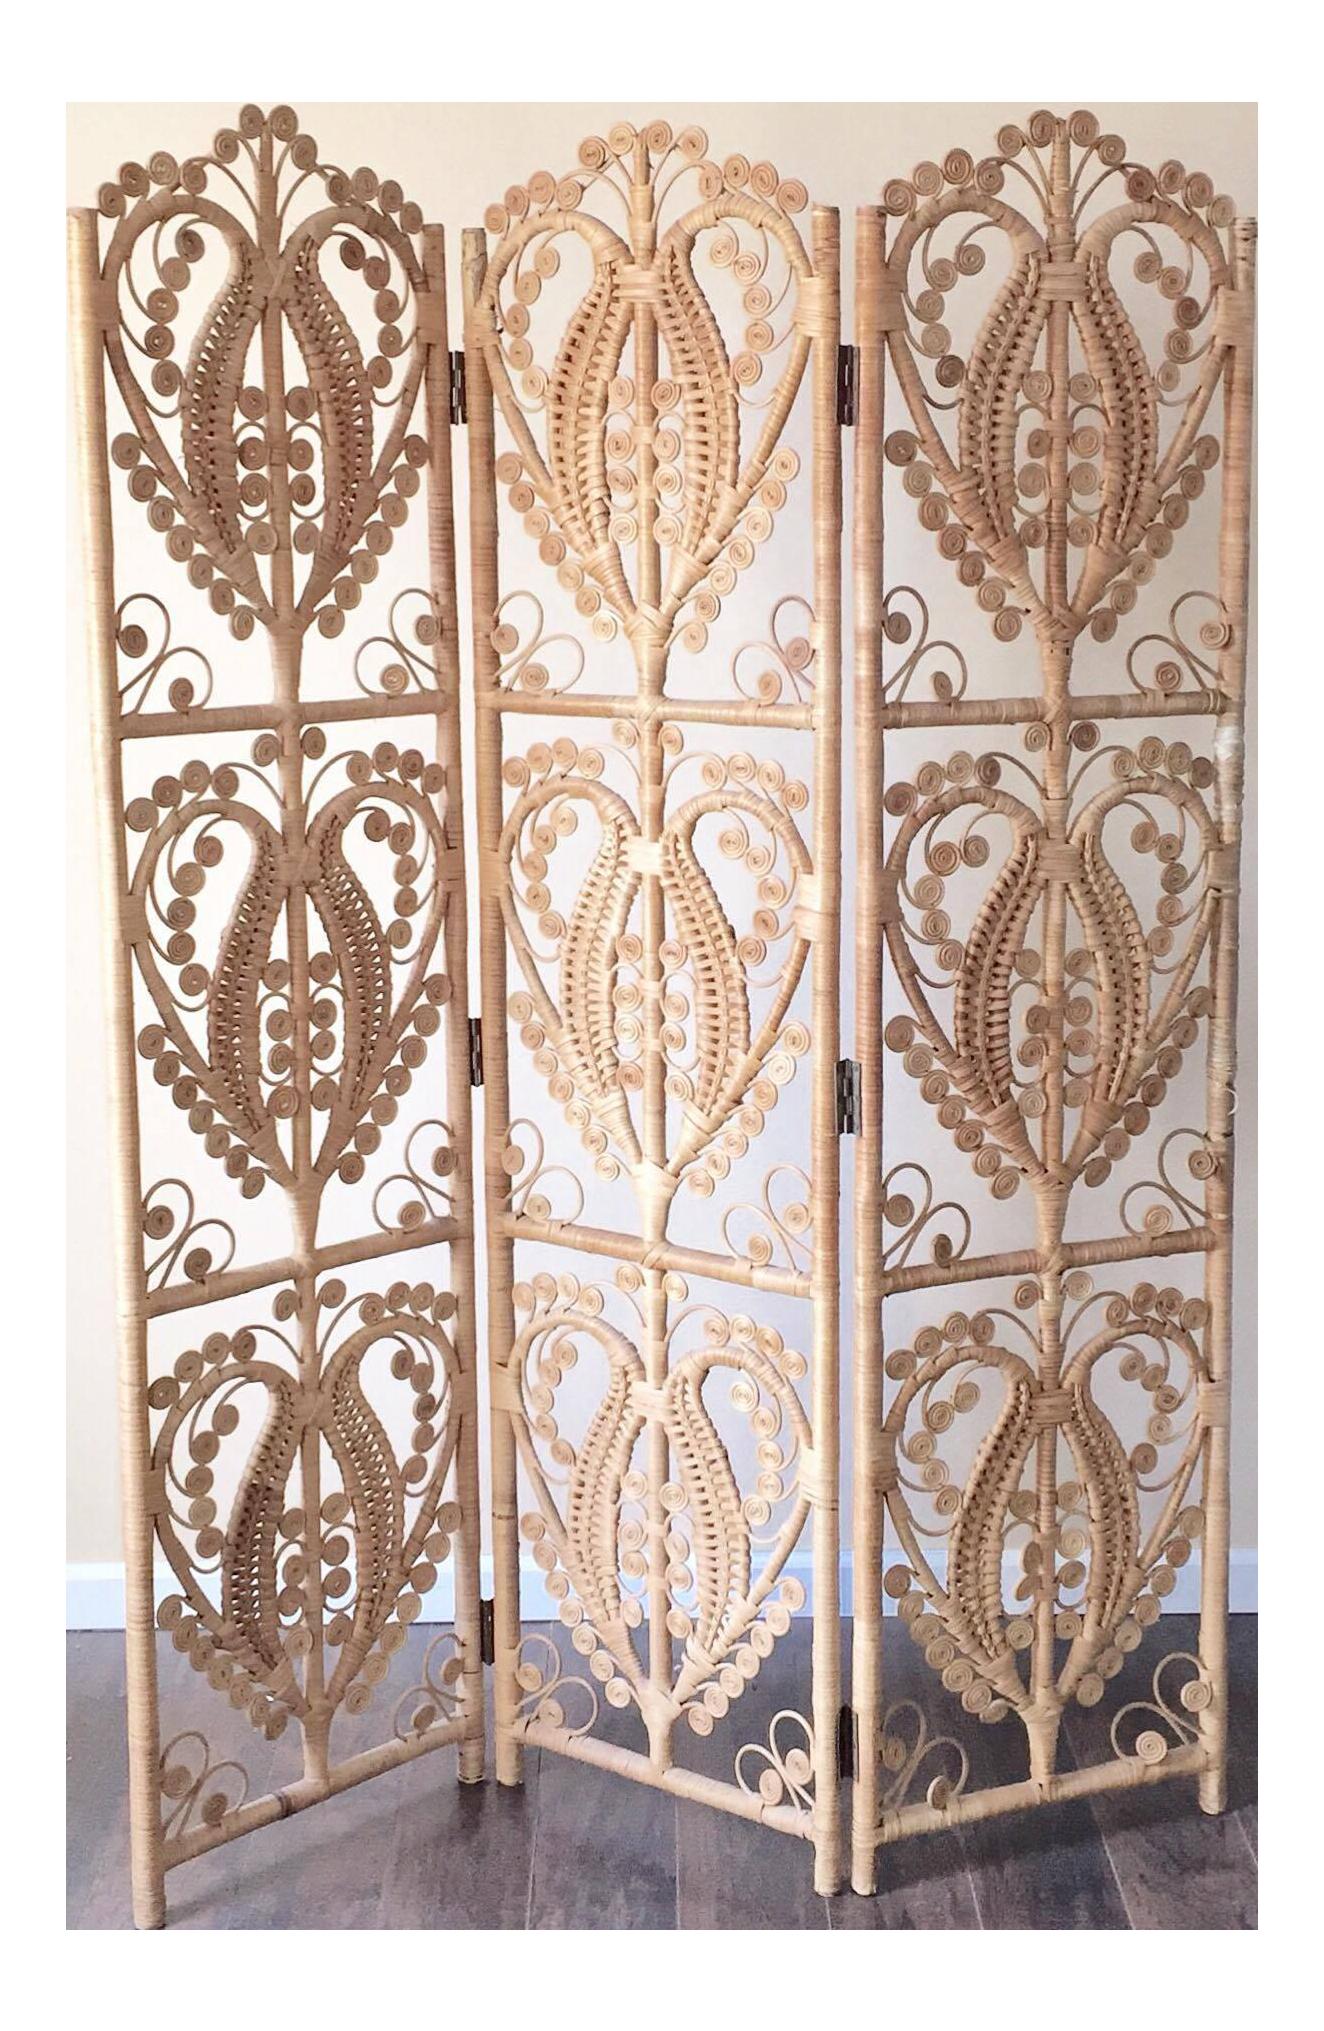 Vintage Wicker Peacock Room Divider 3 Panel Screen Chairish